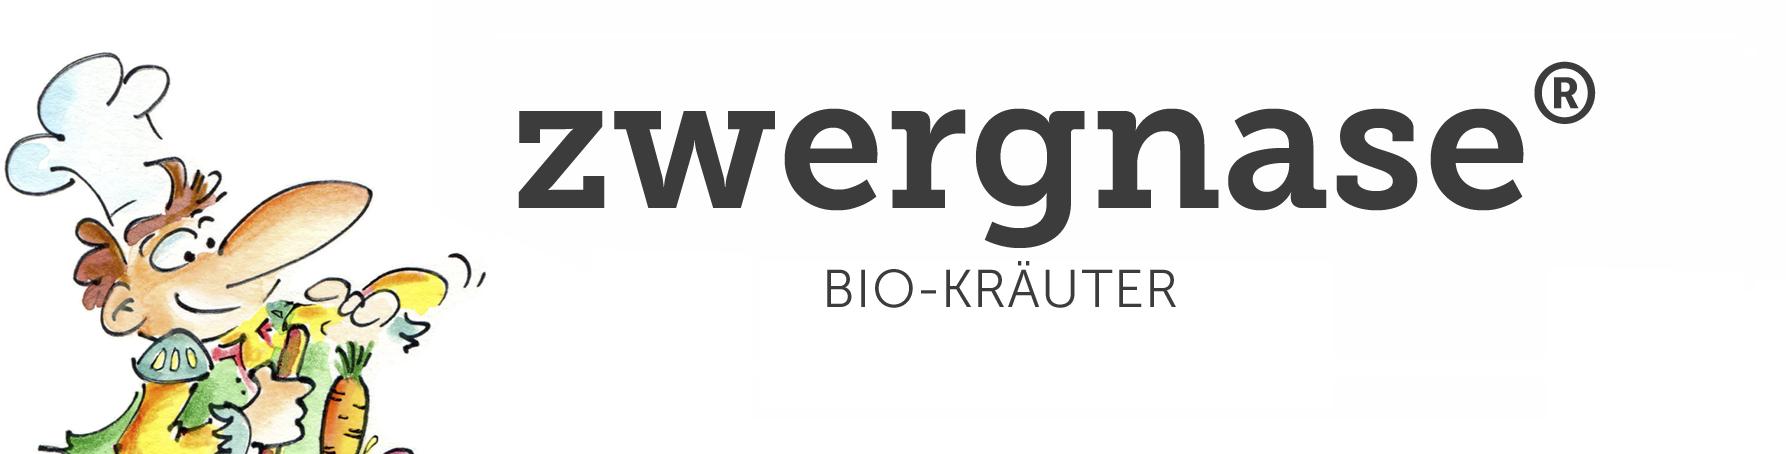 ZWERGNASE Bio-Kräuter-Logo